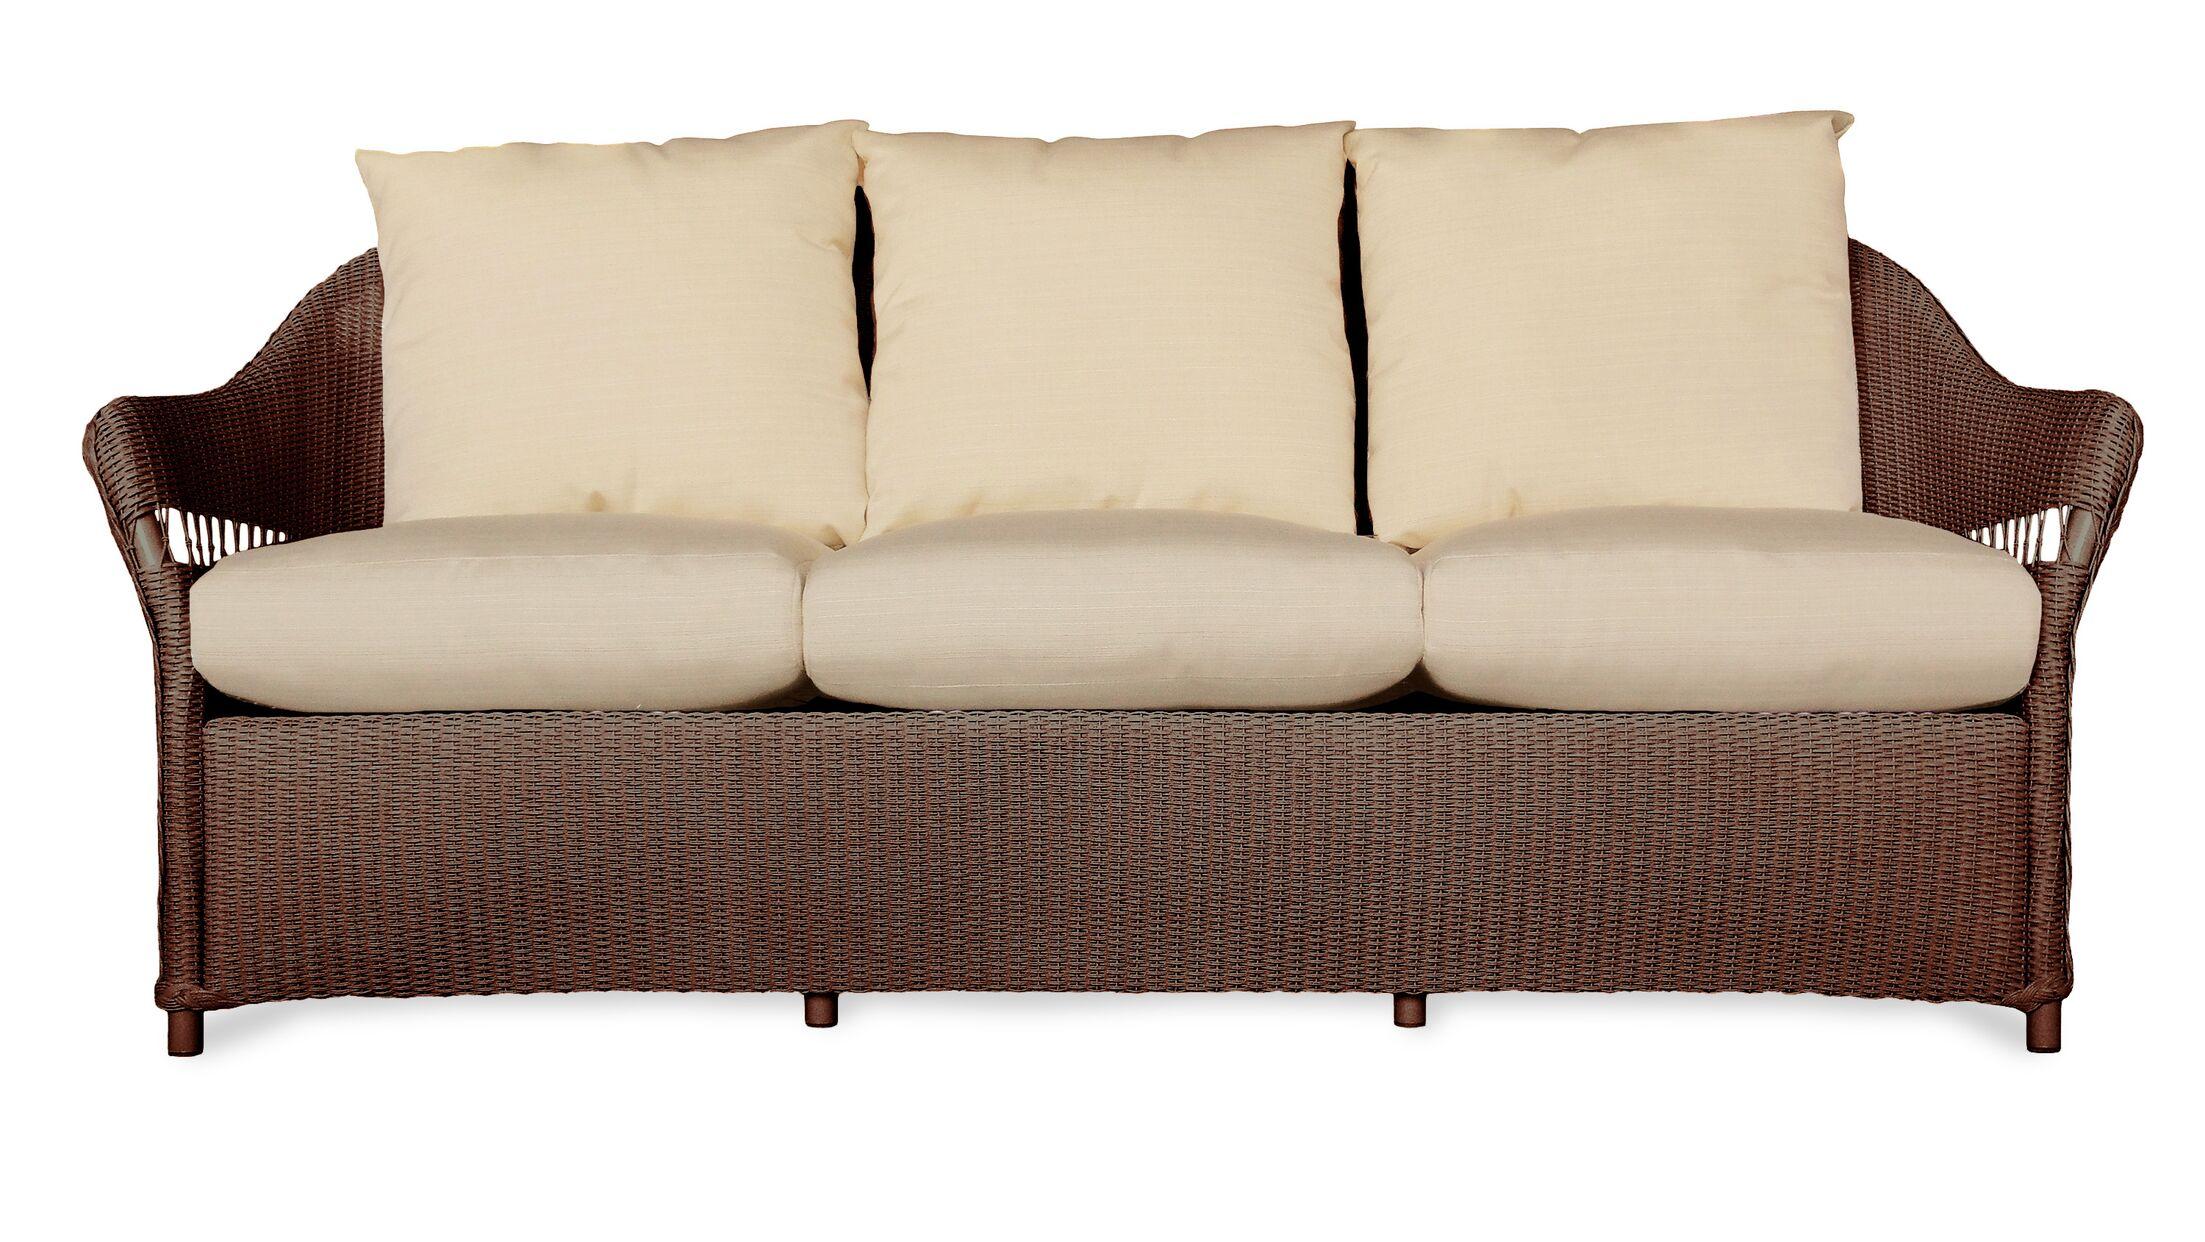 Freeport Patio Sofa